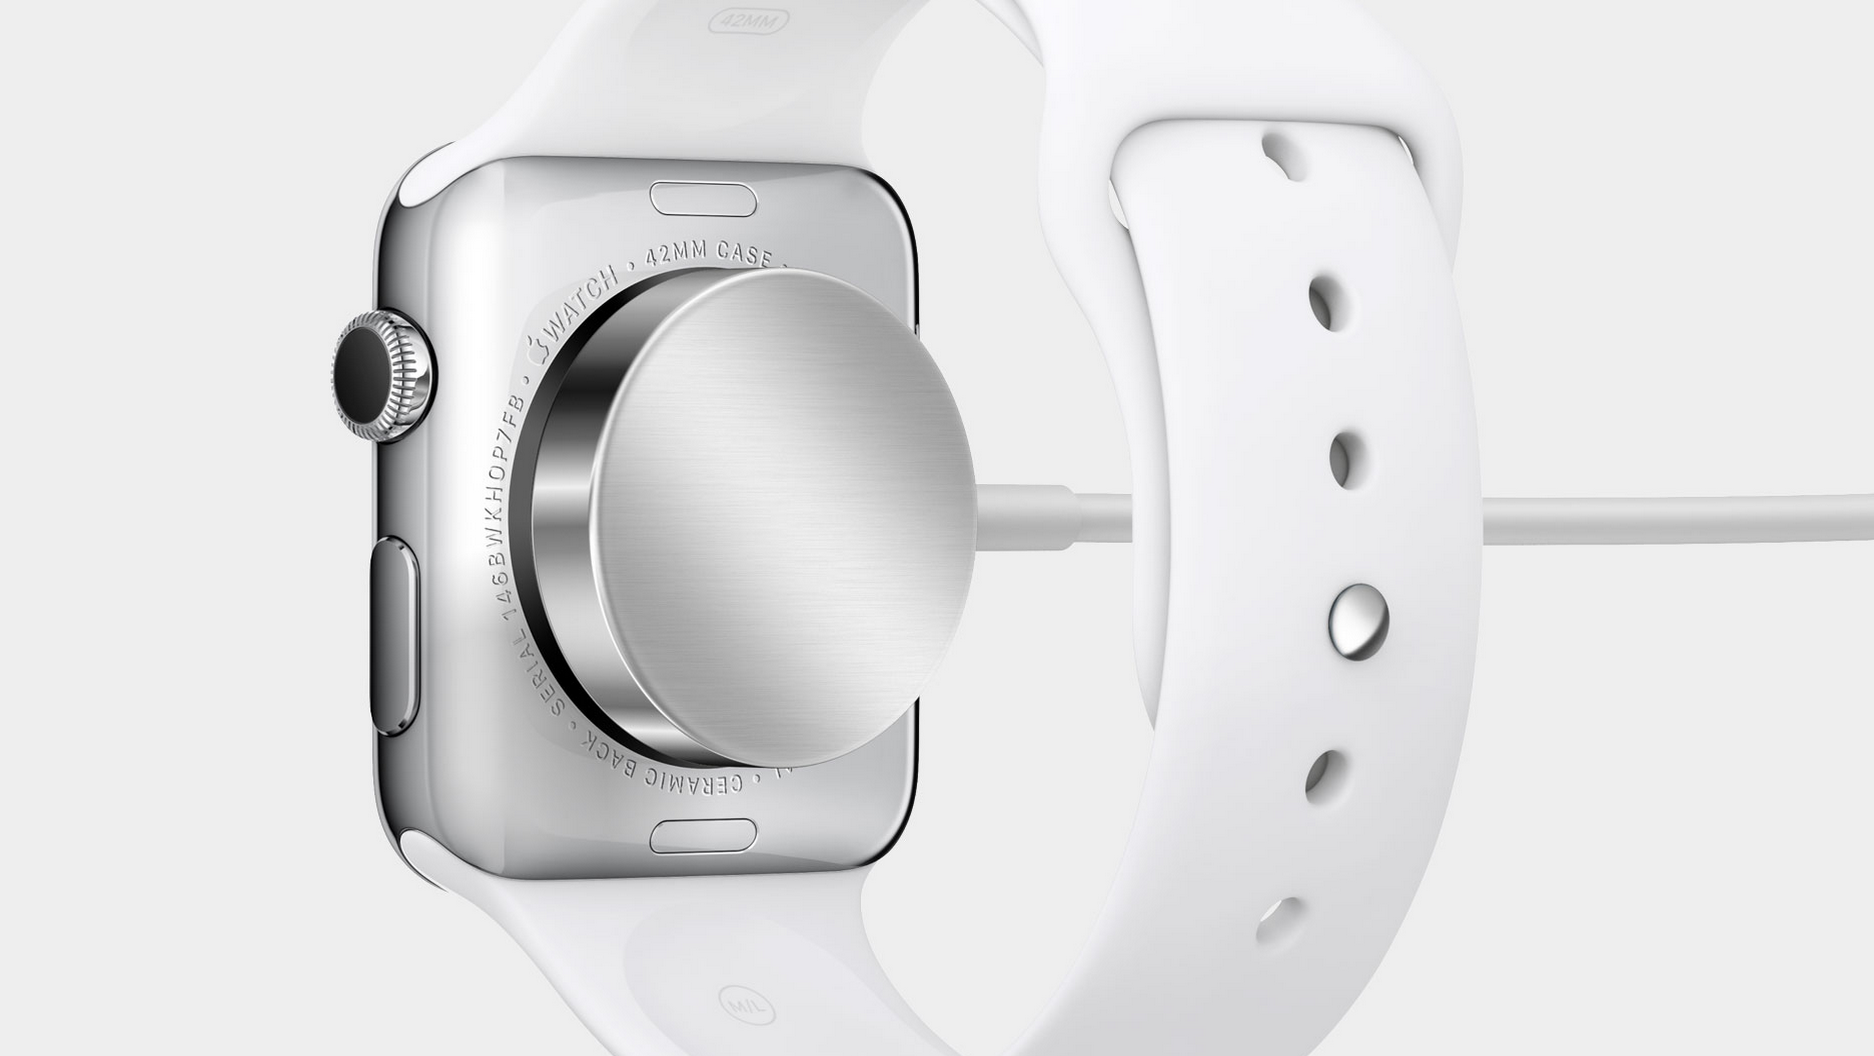 cfc177d7cac Rincian daya tahan baterai Apple Watch INSIGHTMAC. Rincian daya tahan. Pulseira  Para Apple Watch 42mm Capinhas no Atacado